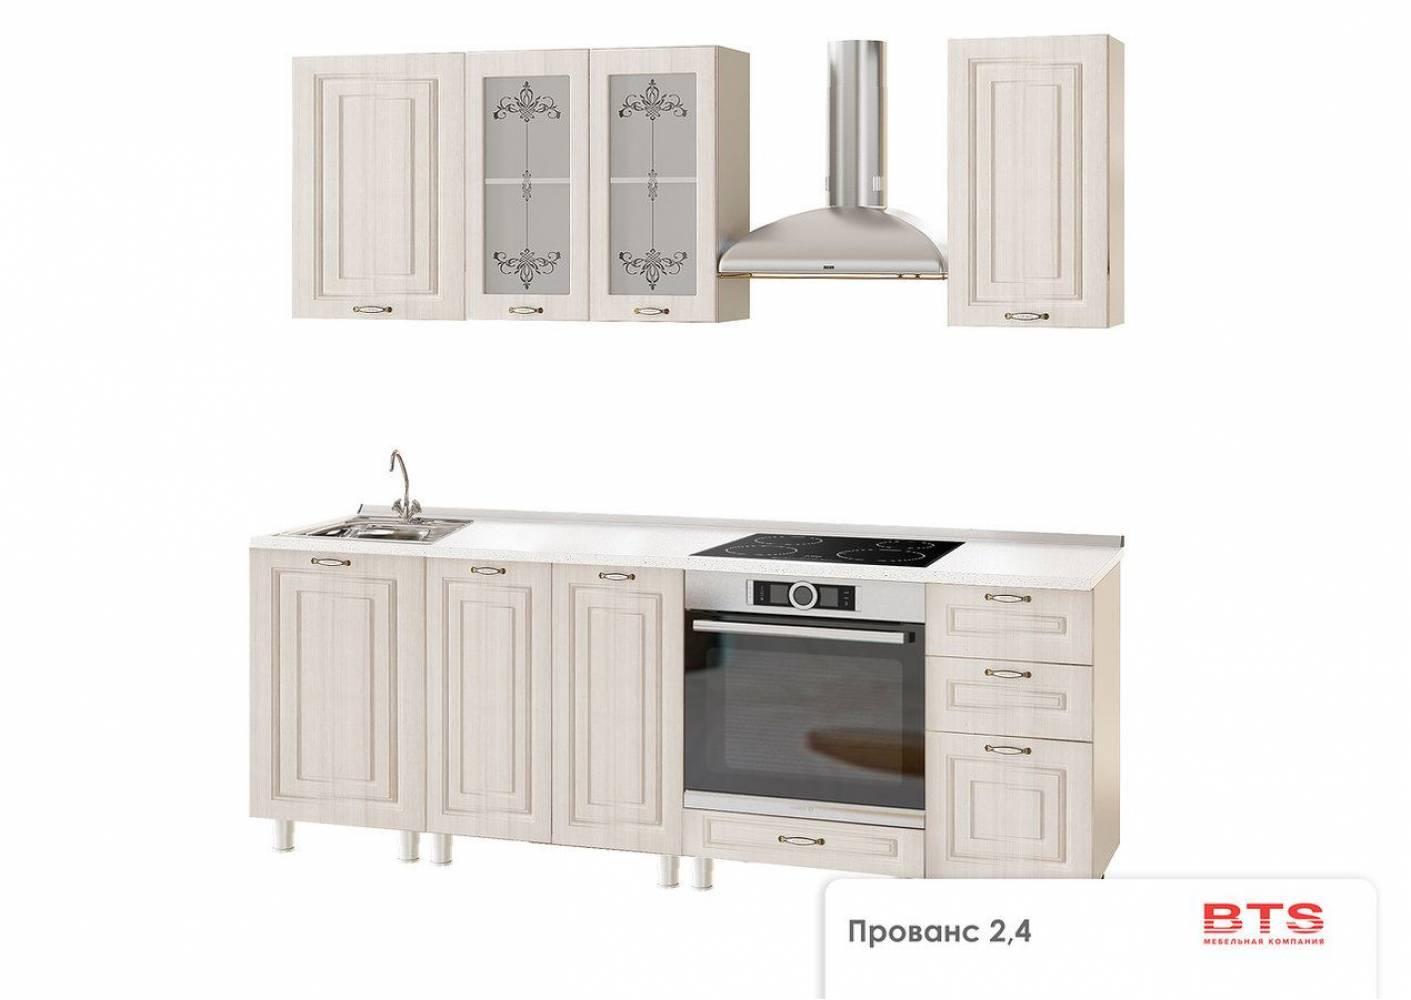 Модульная кухня Прованс 2 (BTS). Комплект 10